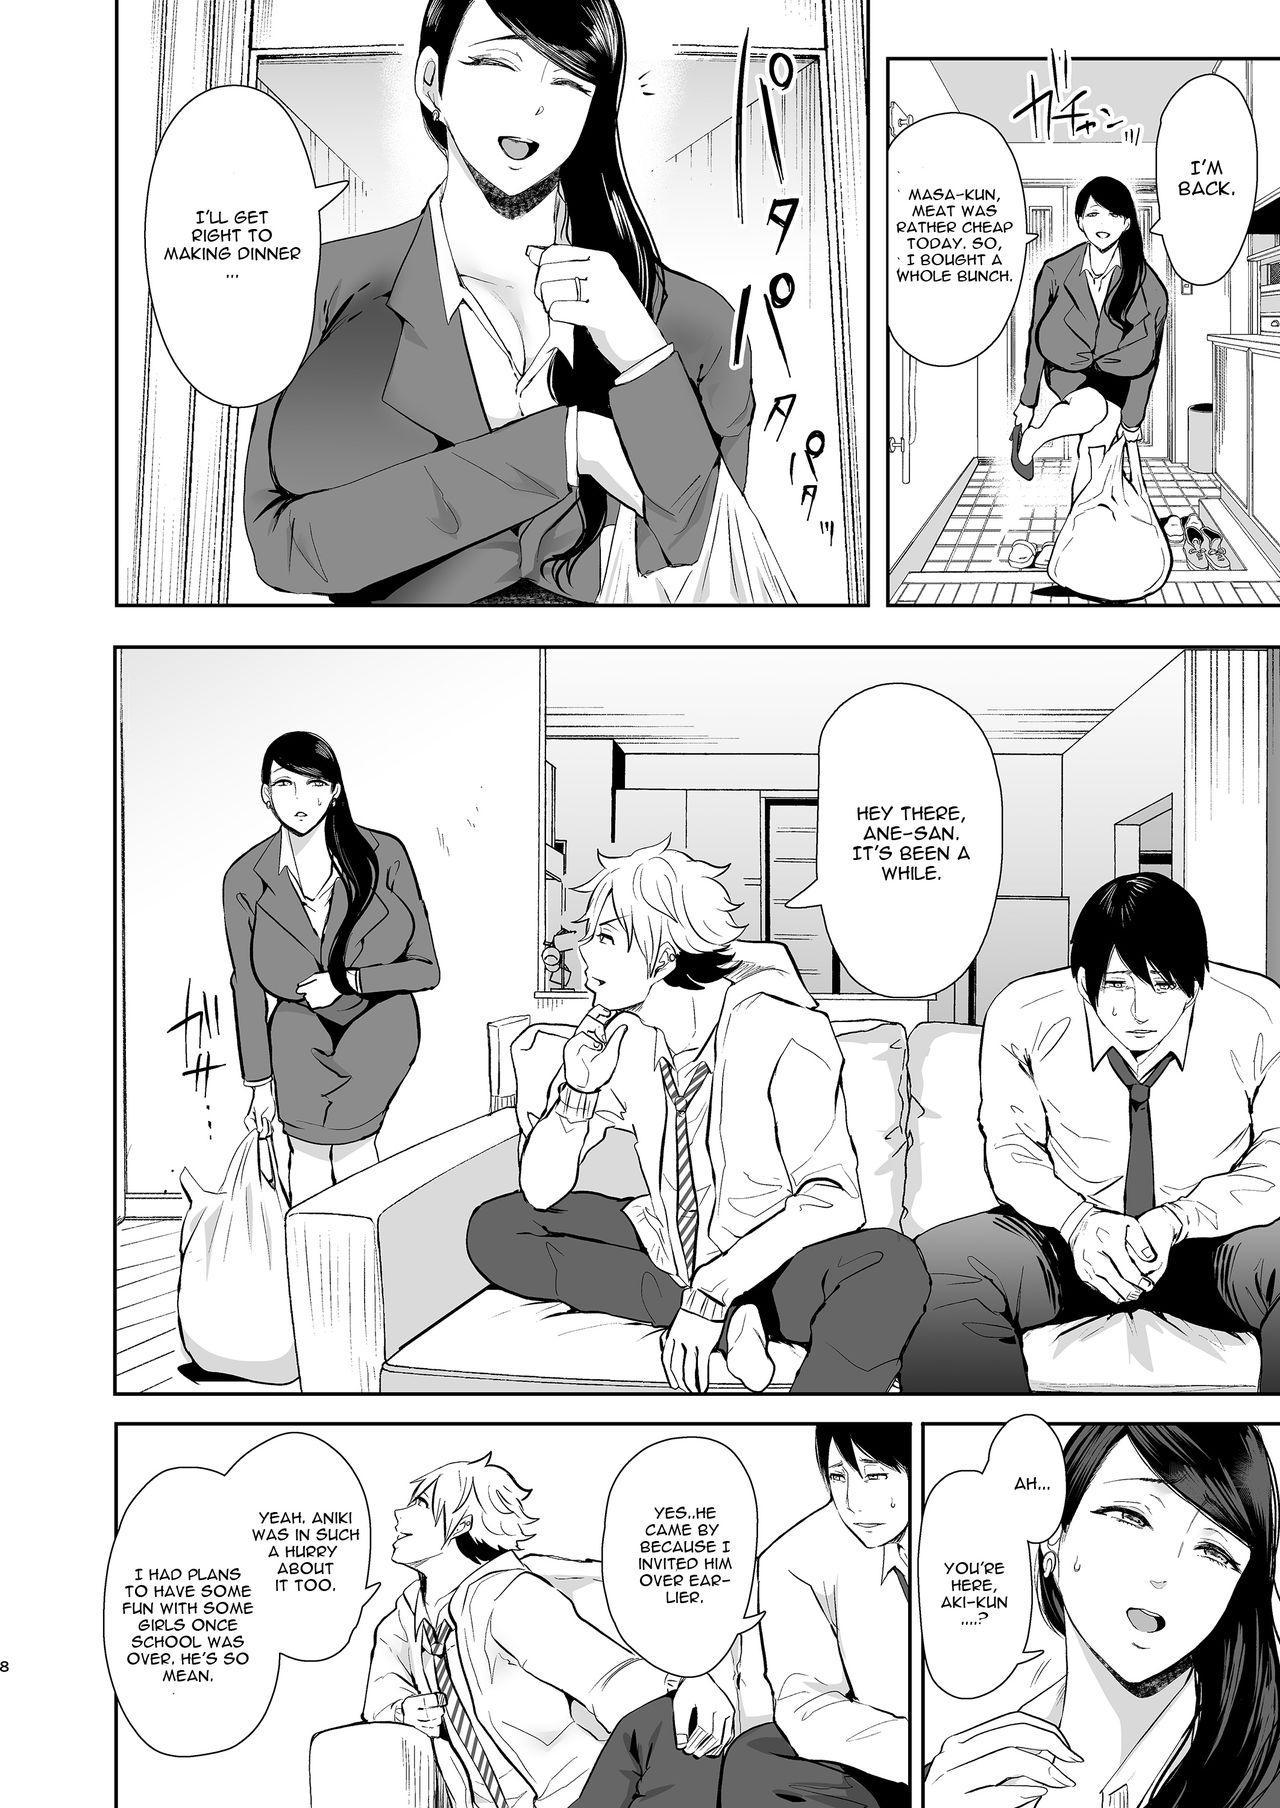 Netorare Ochi Masuda Yukari Hen 6